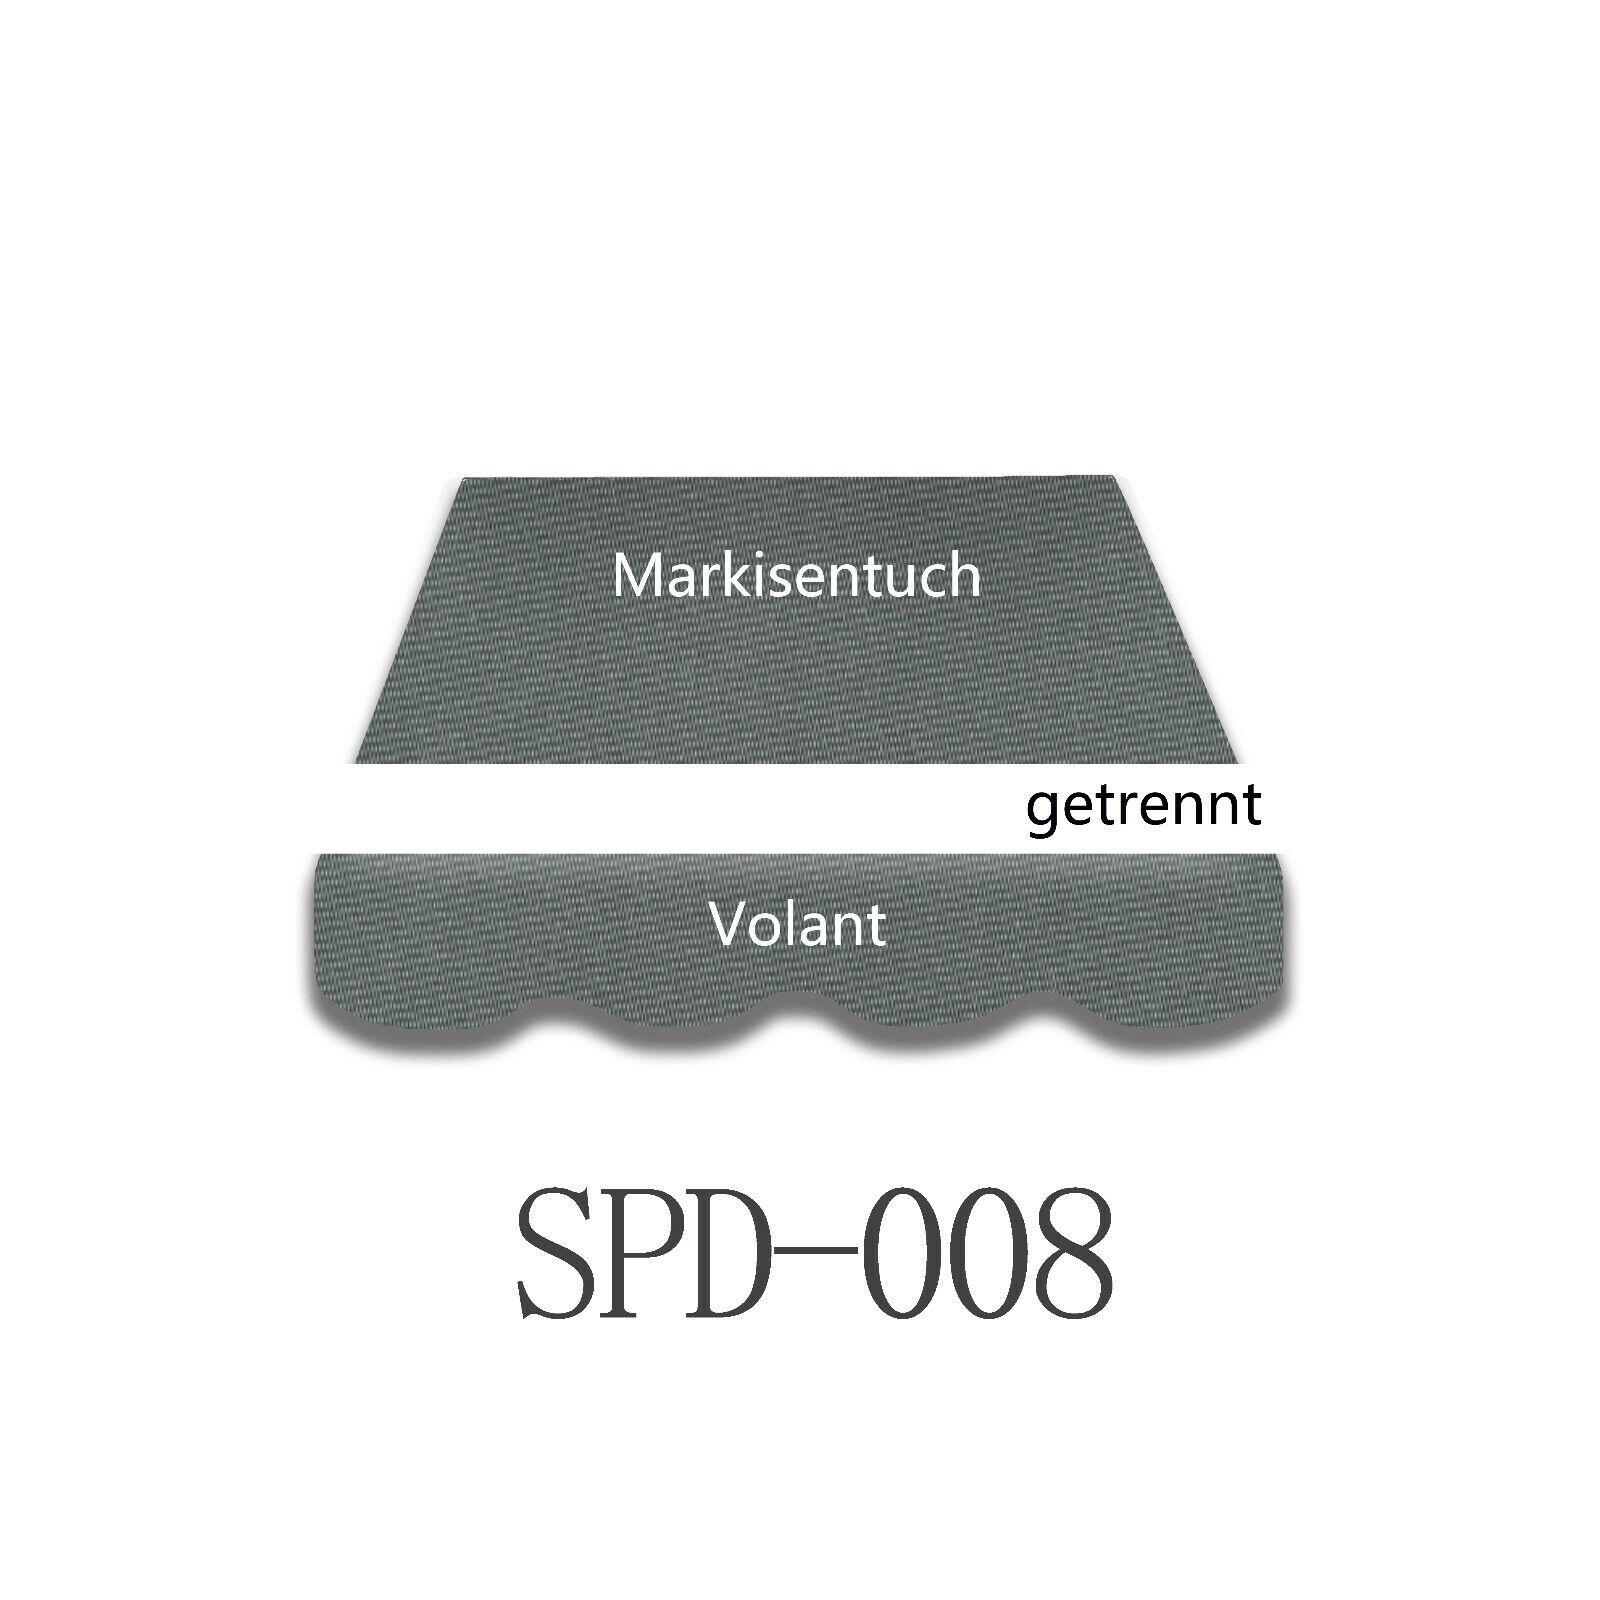 4x3m markisenstoff markisentuch UV resistente al agua sin volant listo cosidos